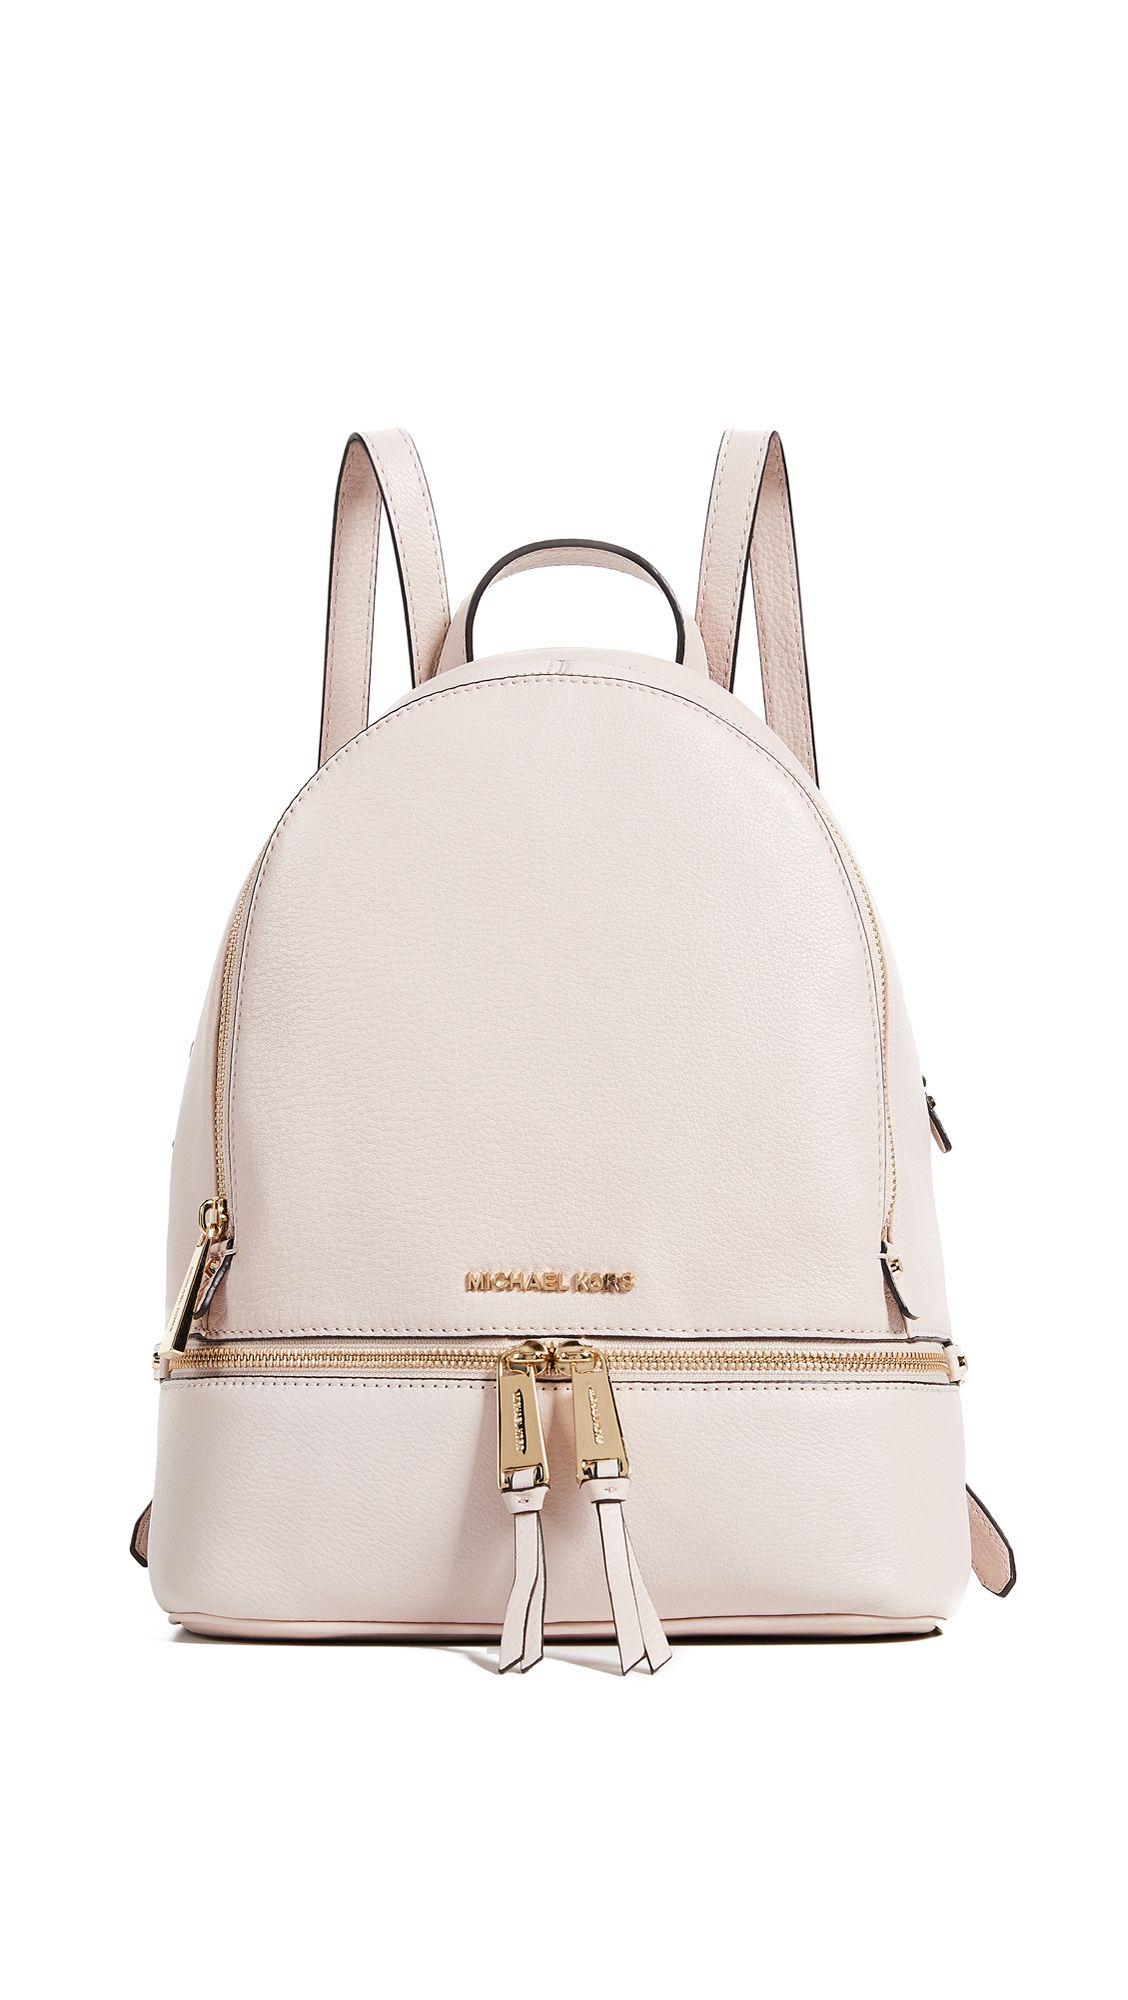 77279b69ed33 MICHAEL MICHAEL KORS RHEA ZIP MEDIUM BACKPACK. #michaelmichaelkors #bags  #leather #backpacks #